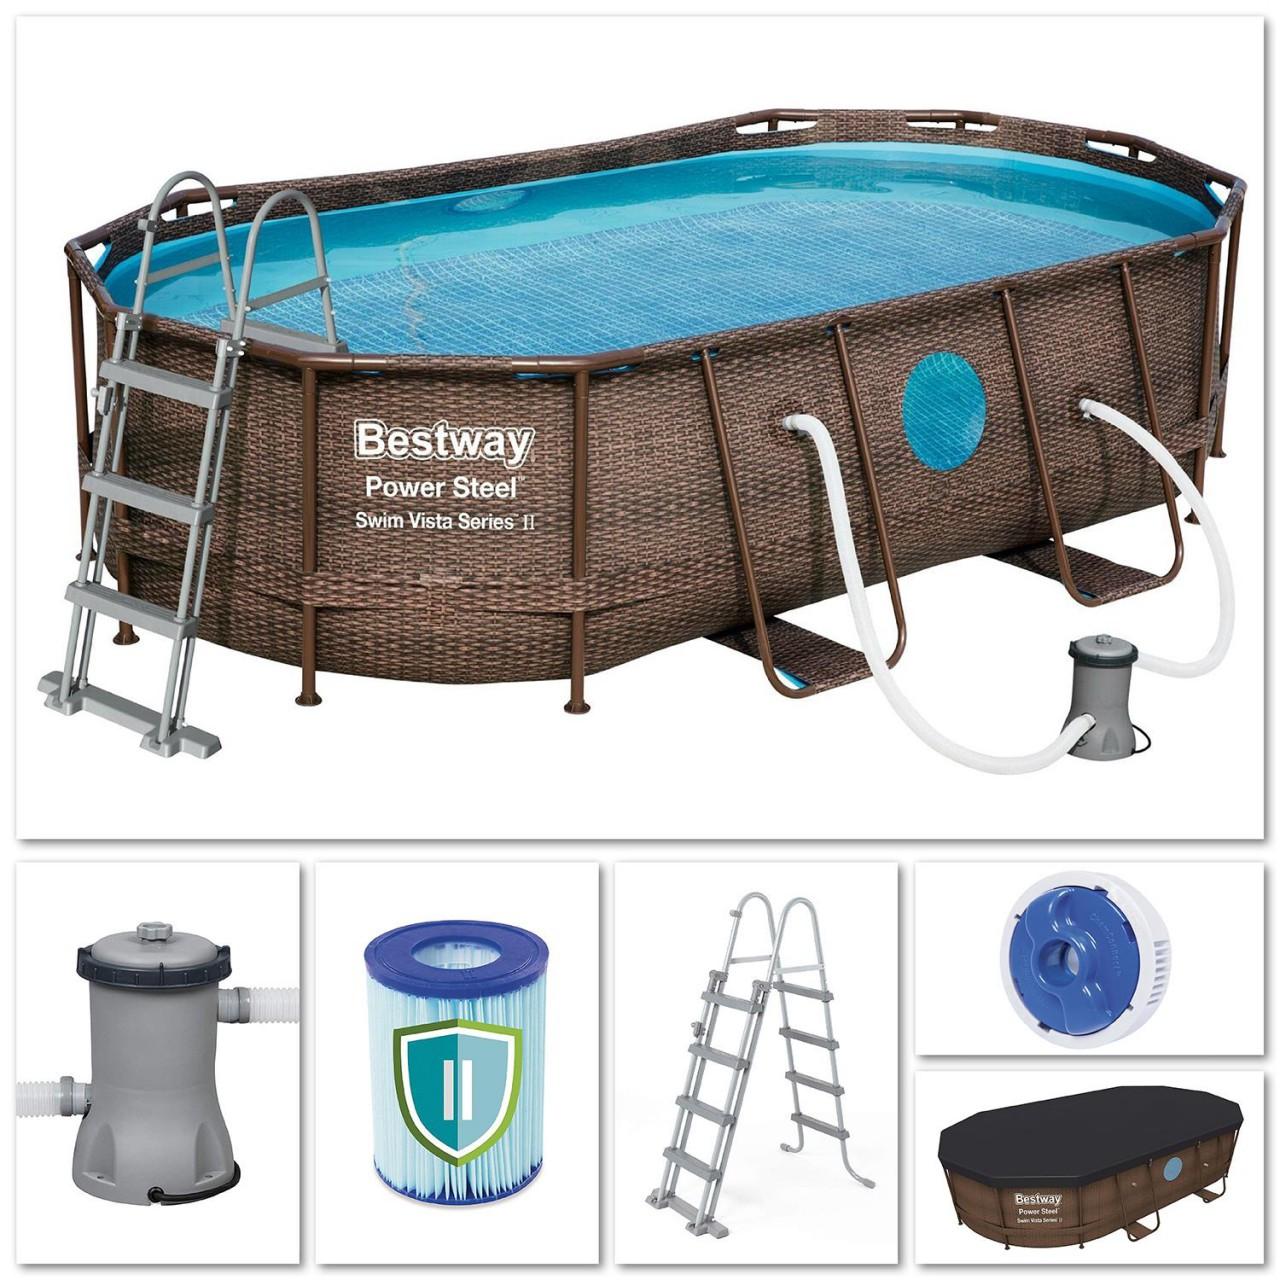 Bestway 56714 Power Steel Pool Oval Set Rattanoptik 427x250x100 cm